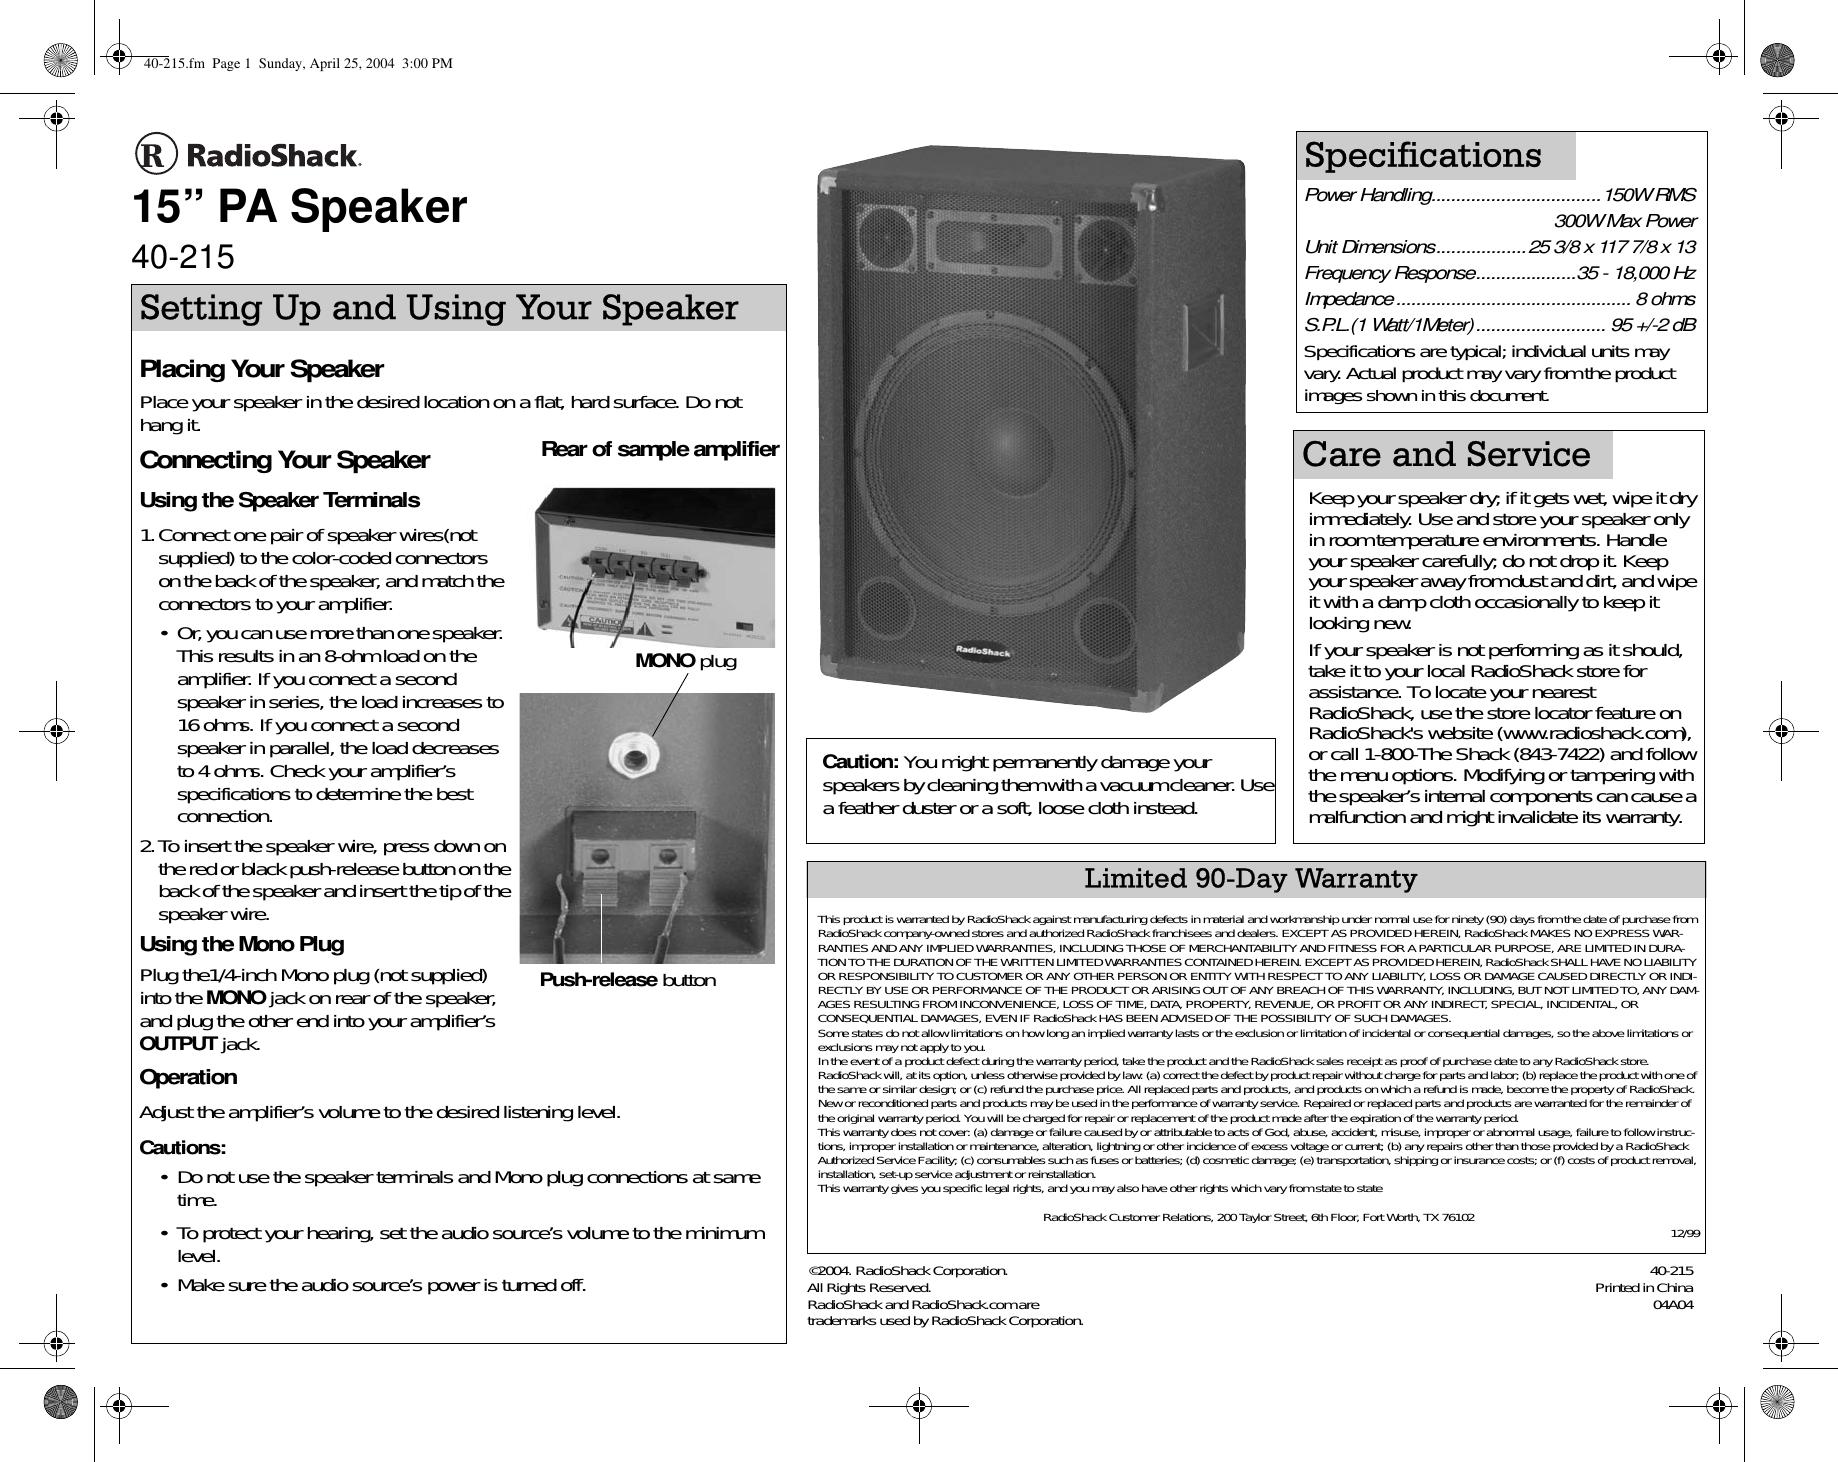 rca sps3600 kitchen radio manual